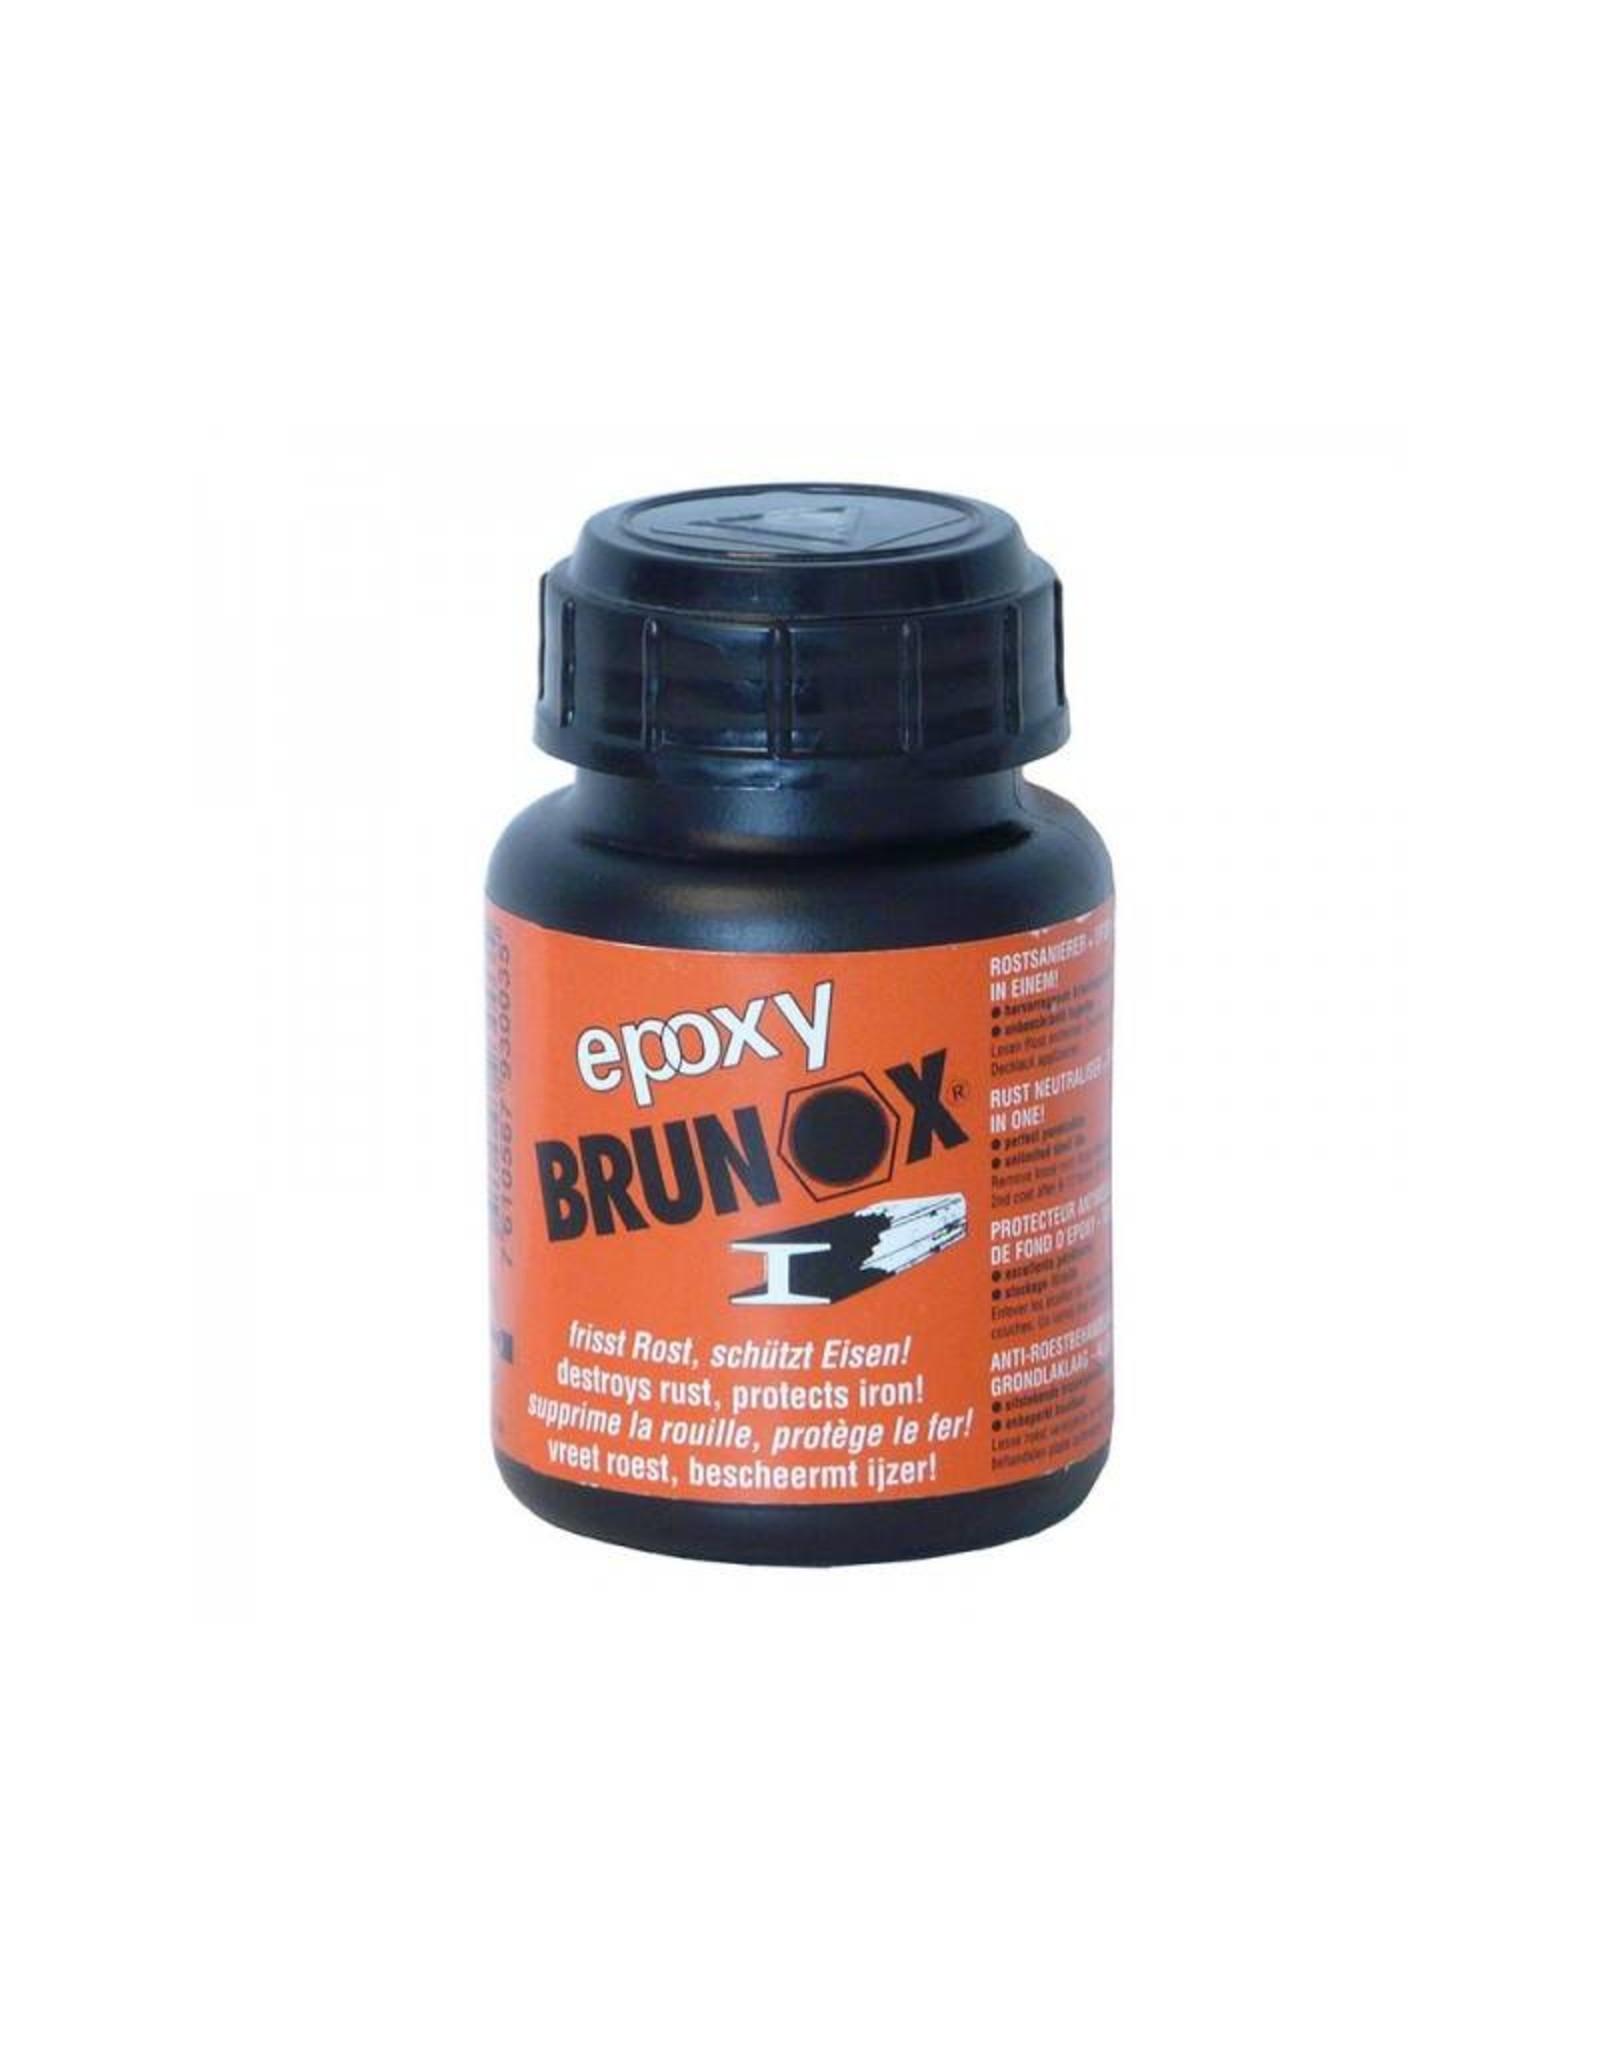 BRUNOX? Epoxy 100ml roeststop